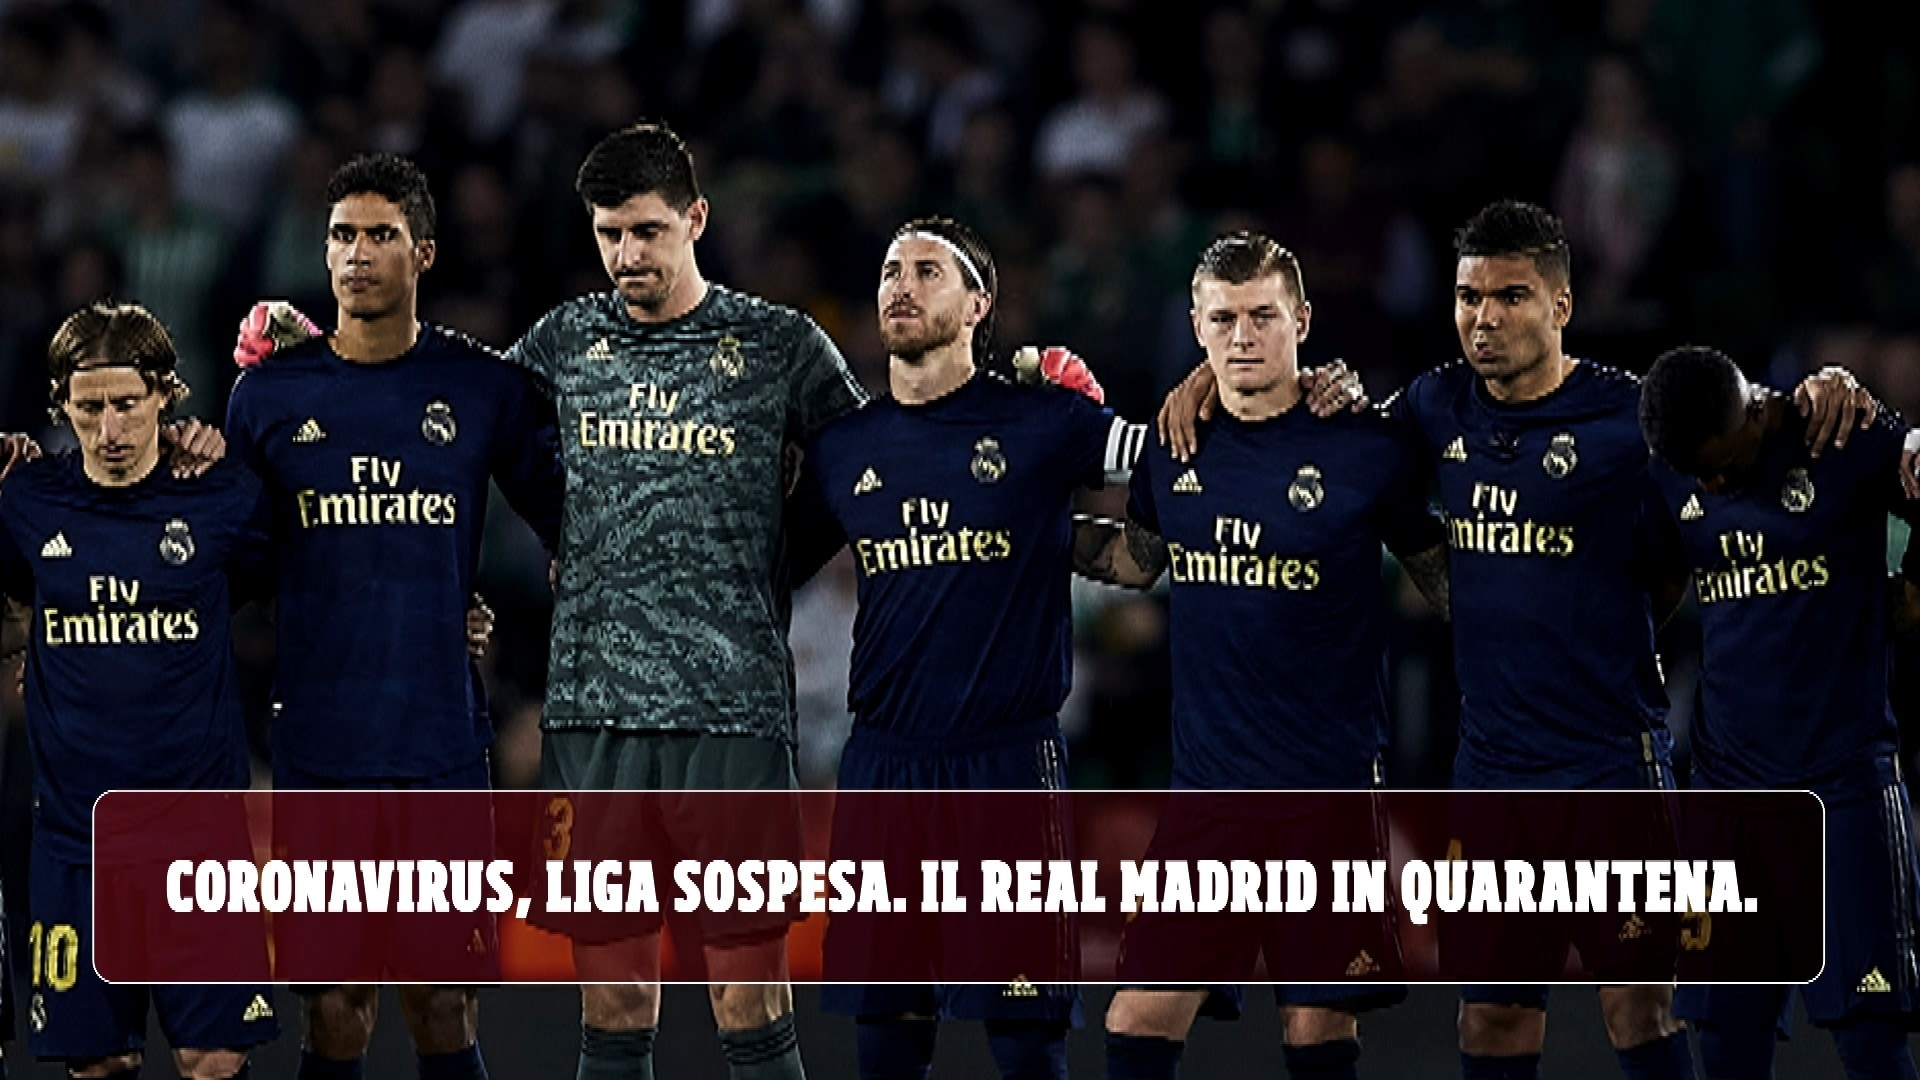 Coronavirus, Liga sospesa. Il Real Madrid in quarantena!